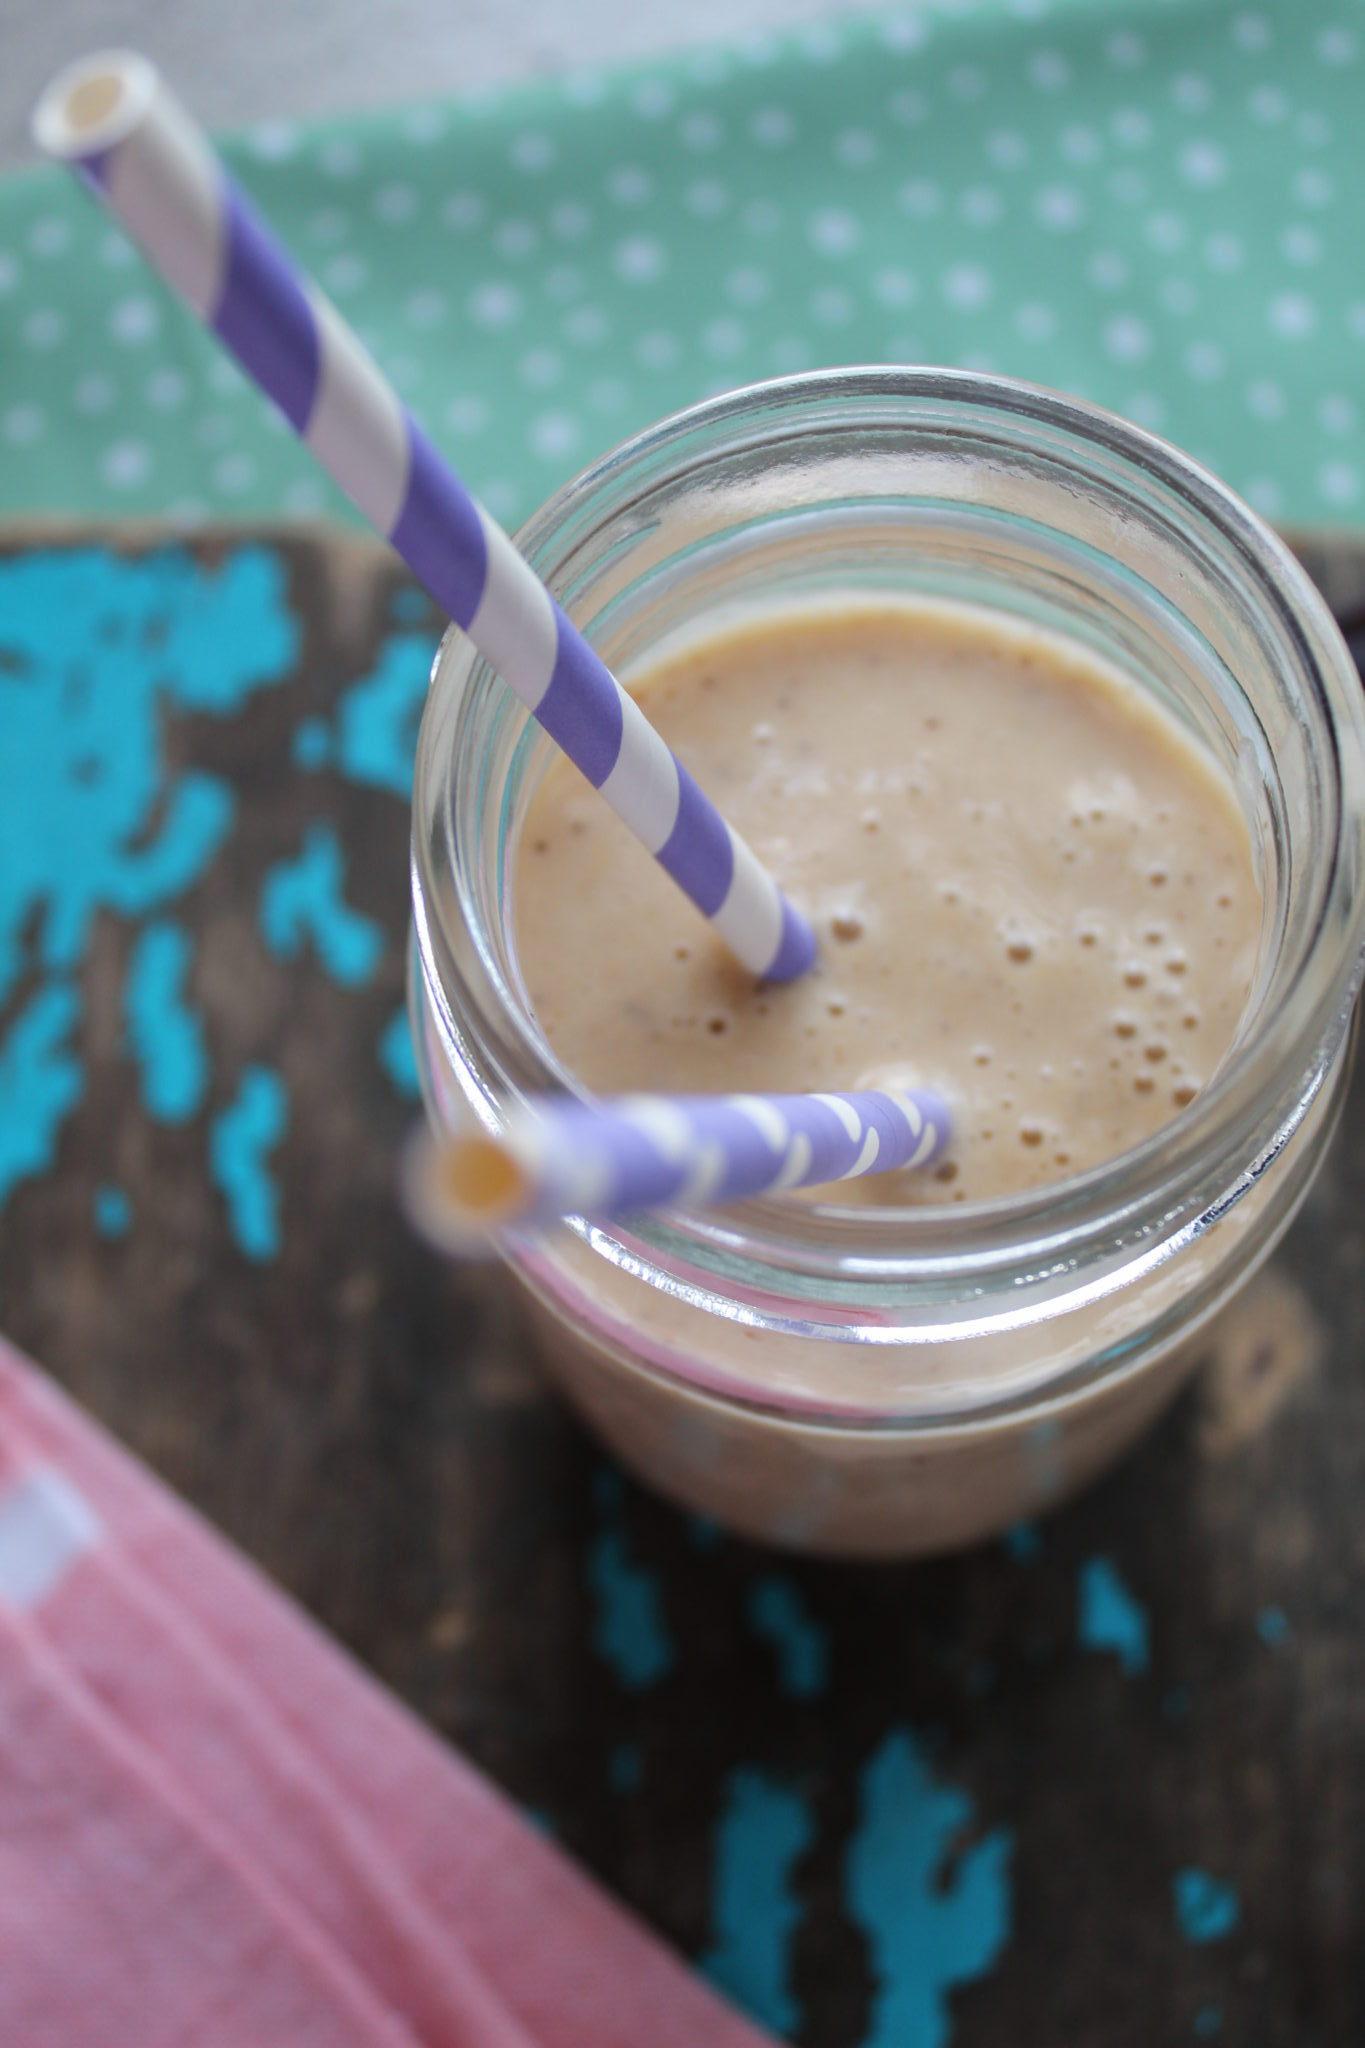 Vegansk peanut butter/banan smoothie